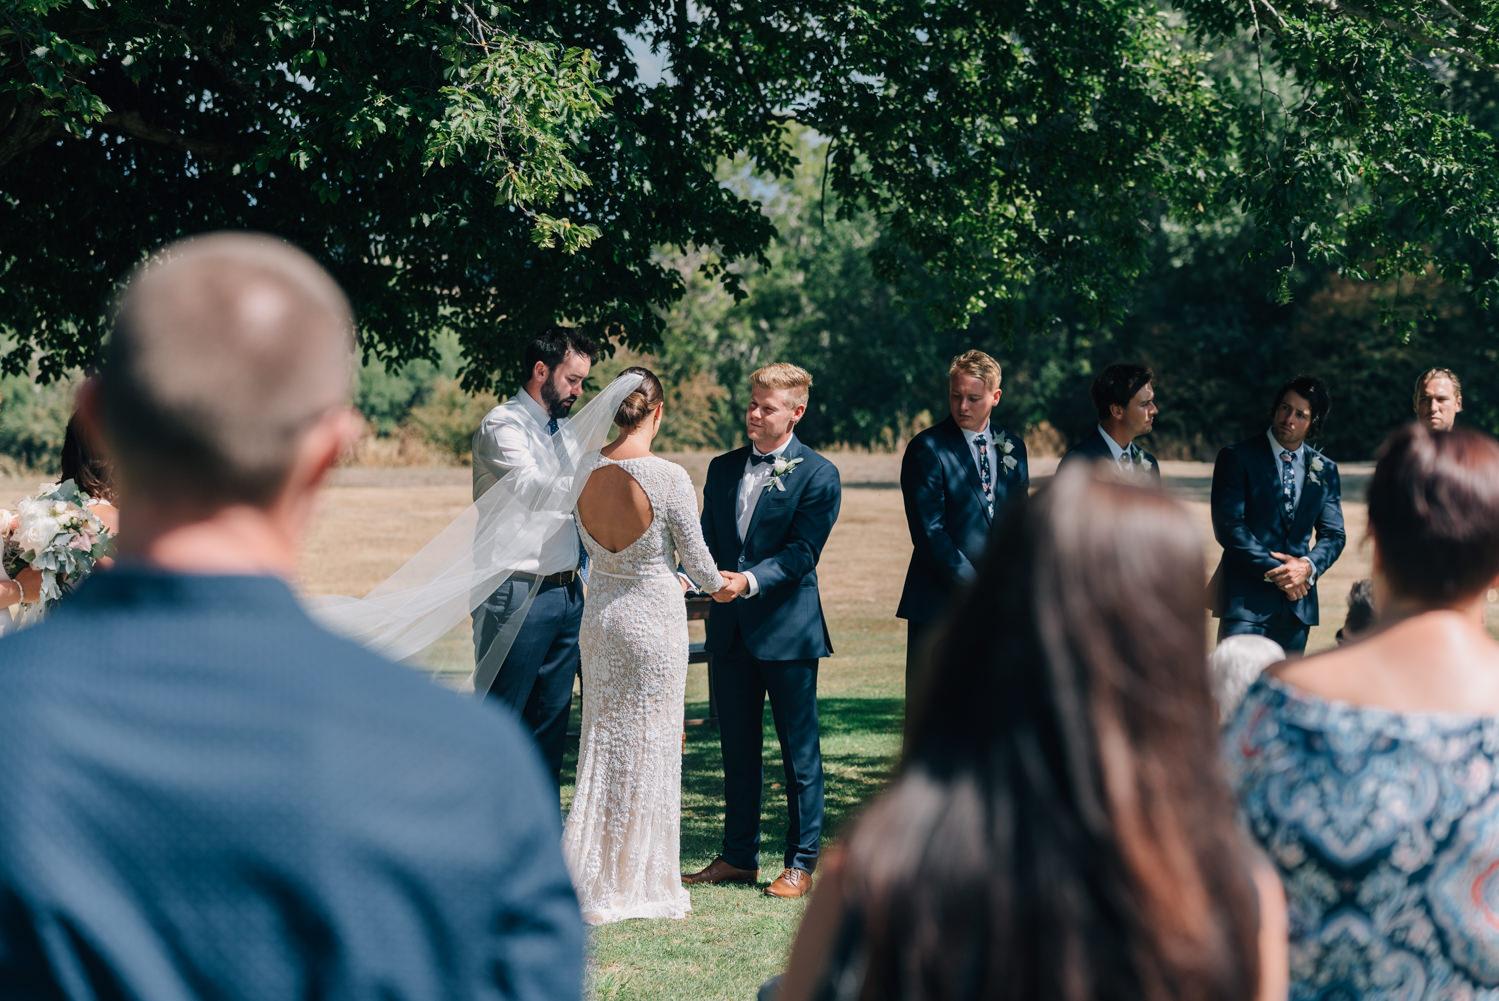 Quamby-Wedding-Photography-61.jpg